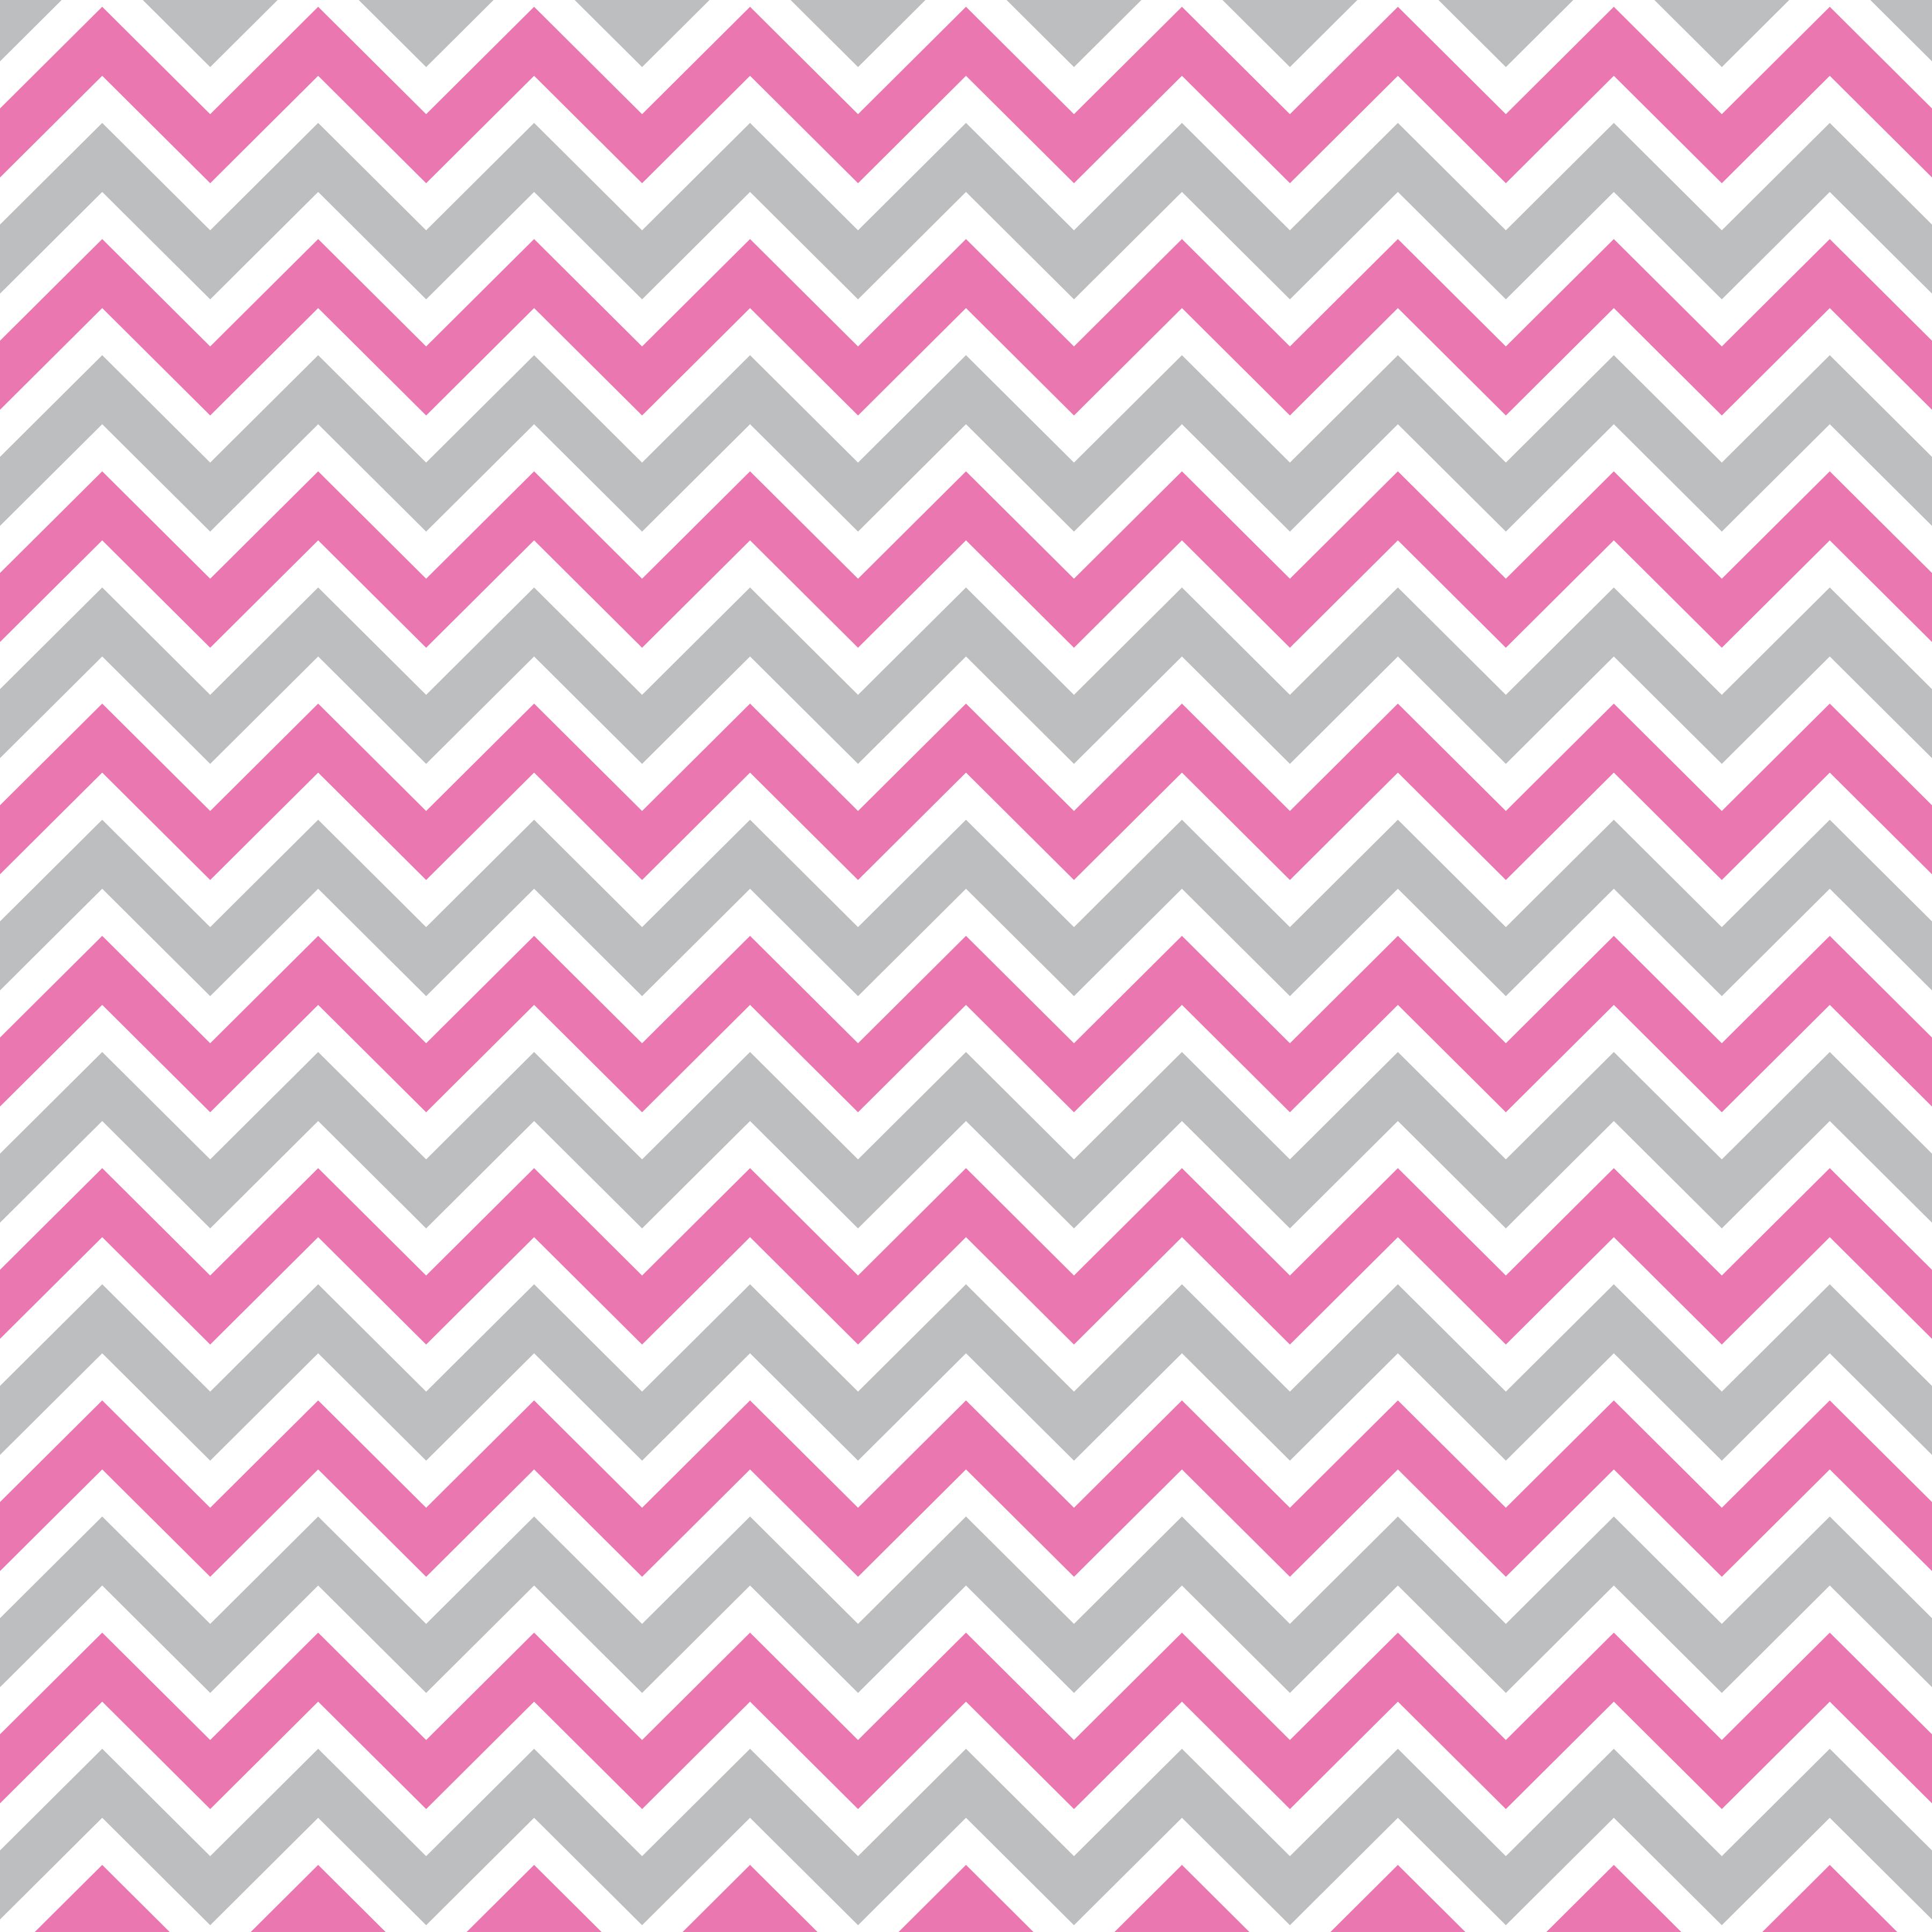 White Gray Pink Chevron Background Wallpaper Wp4008523